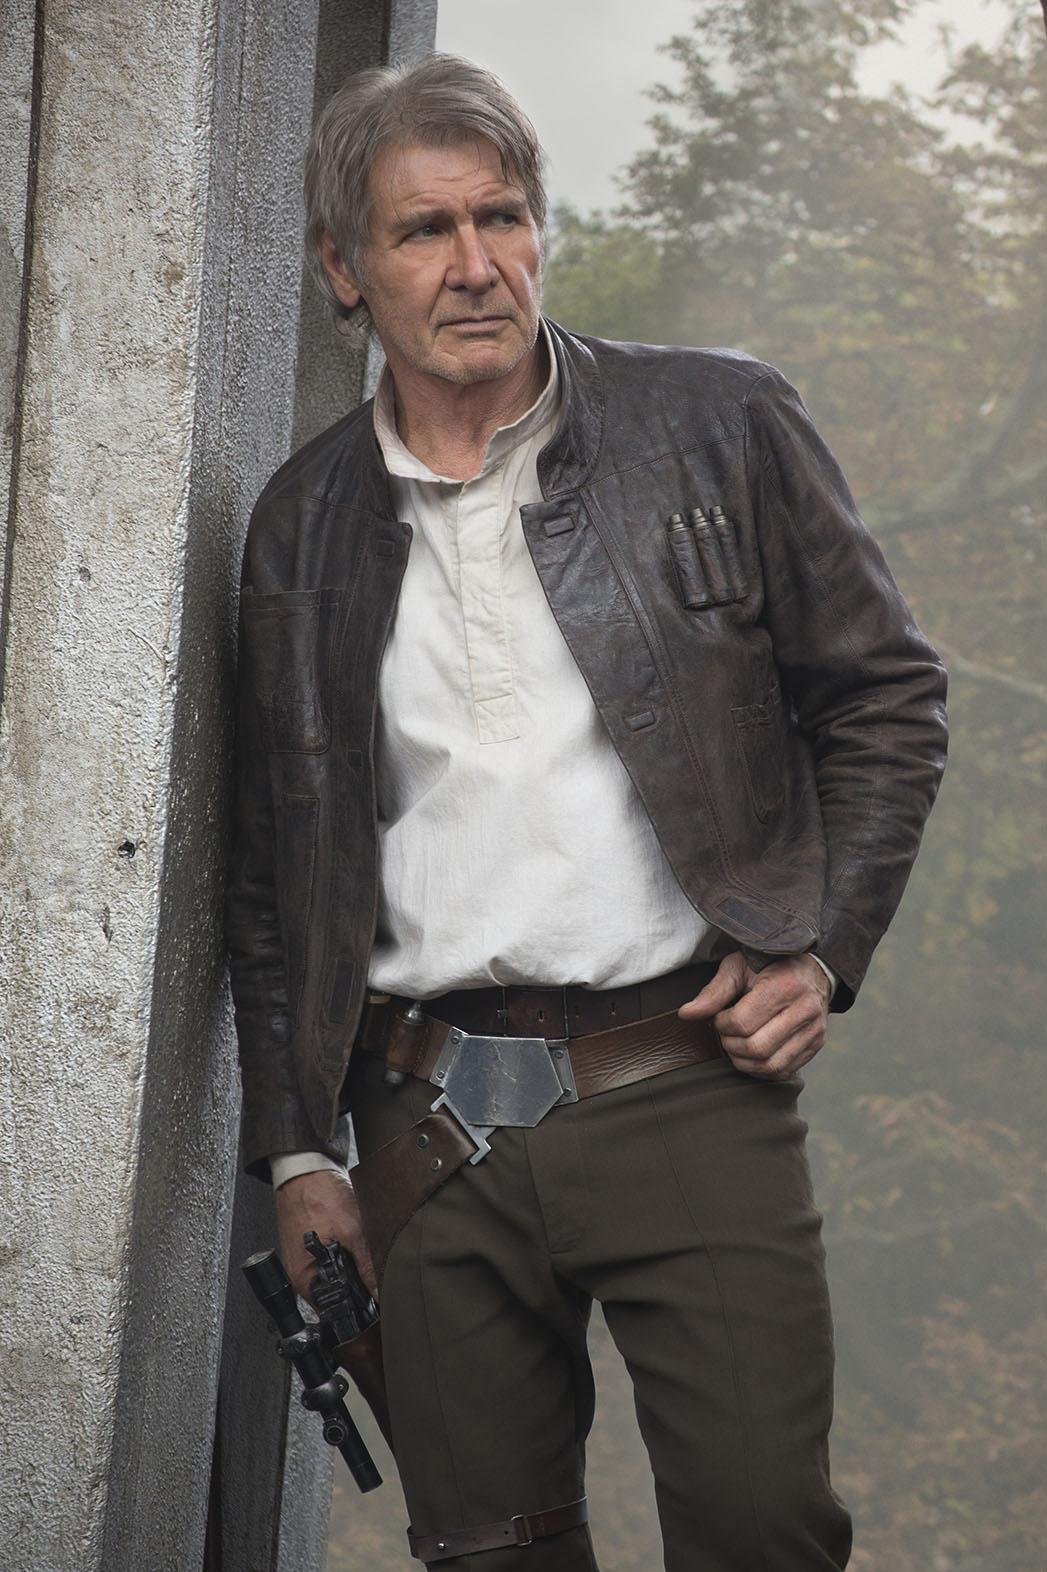 Star Wars: The Force Awakens Still 17 Harrison Ford  - P 2015